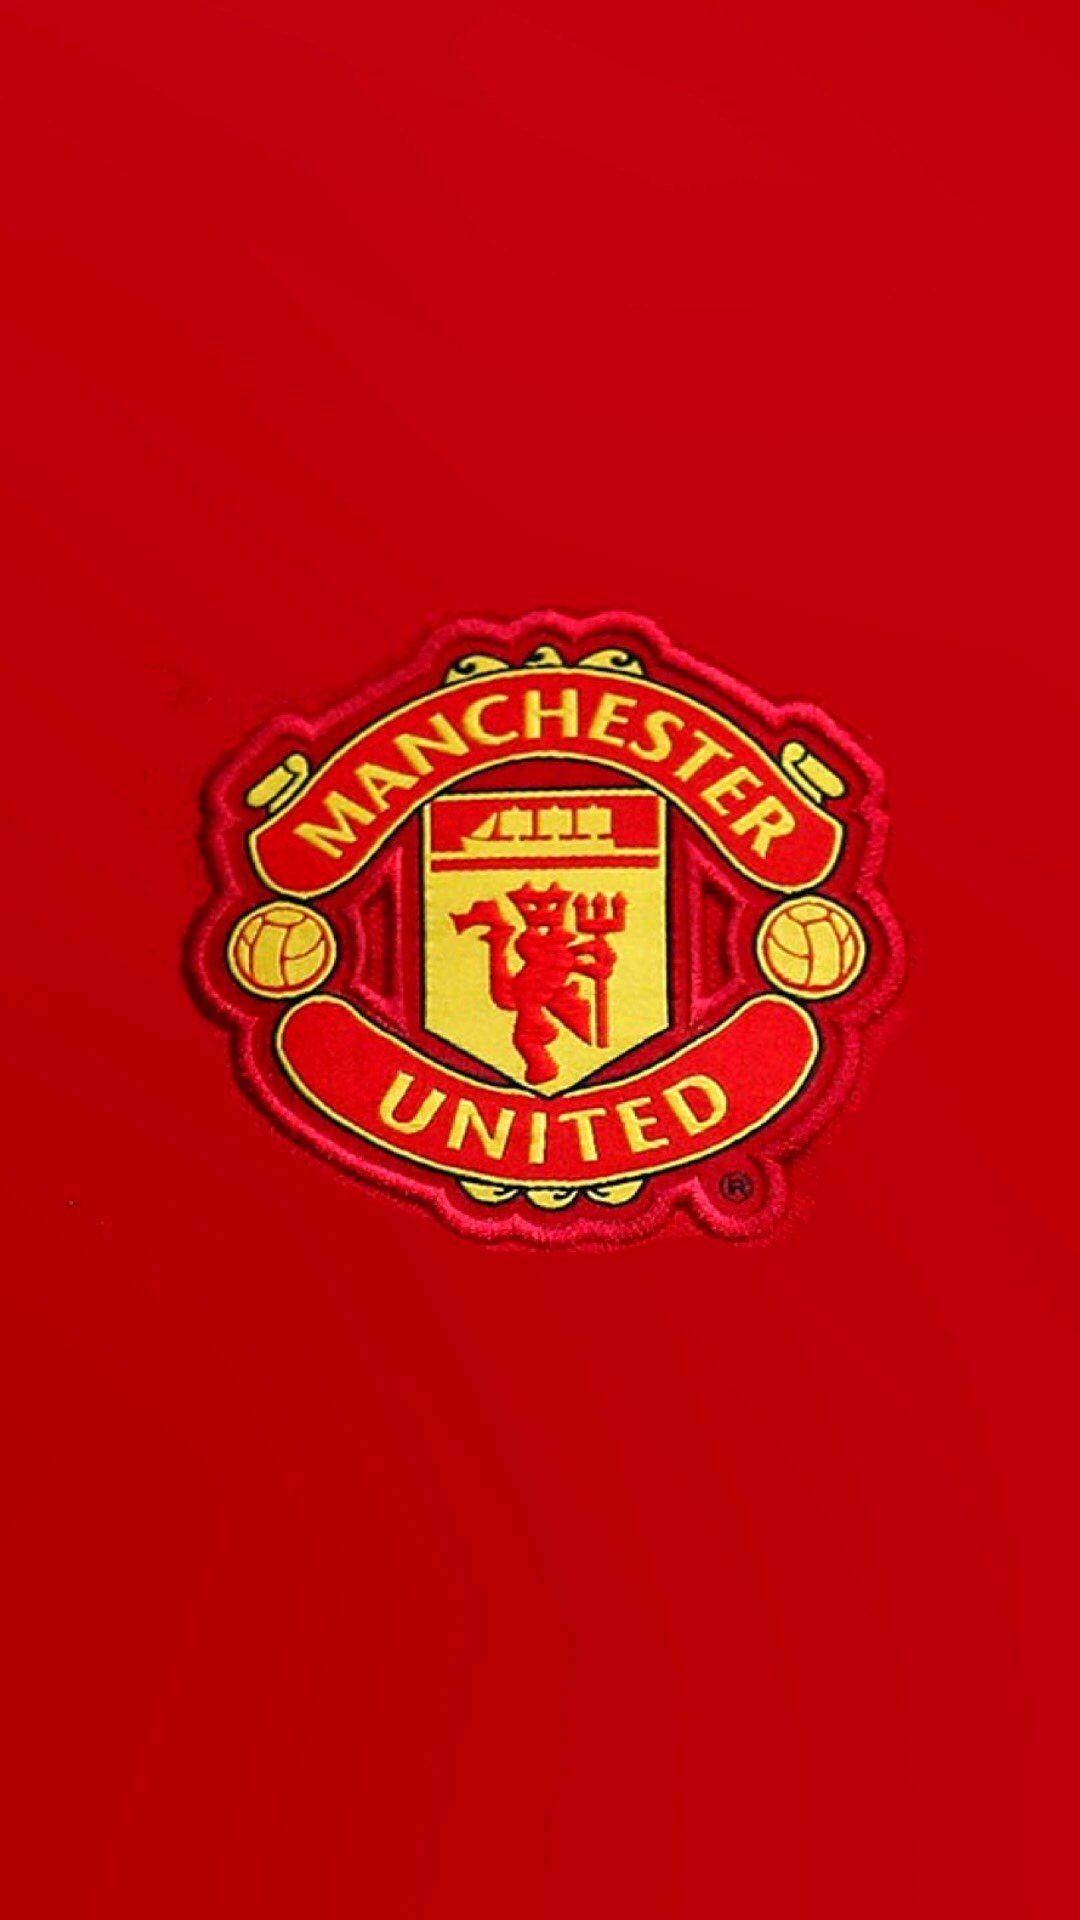 Manchester United Wallpaper Pc 4k Gallery Di 2020 Manchester United Manchester